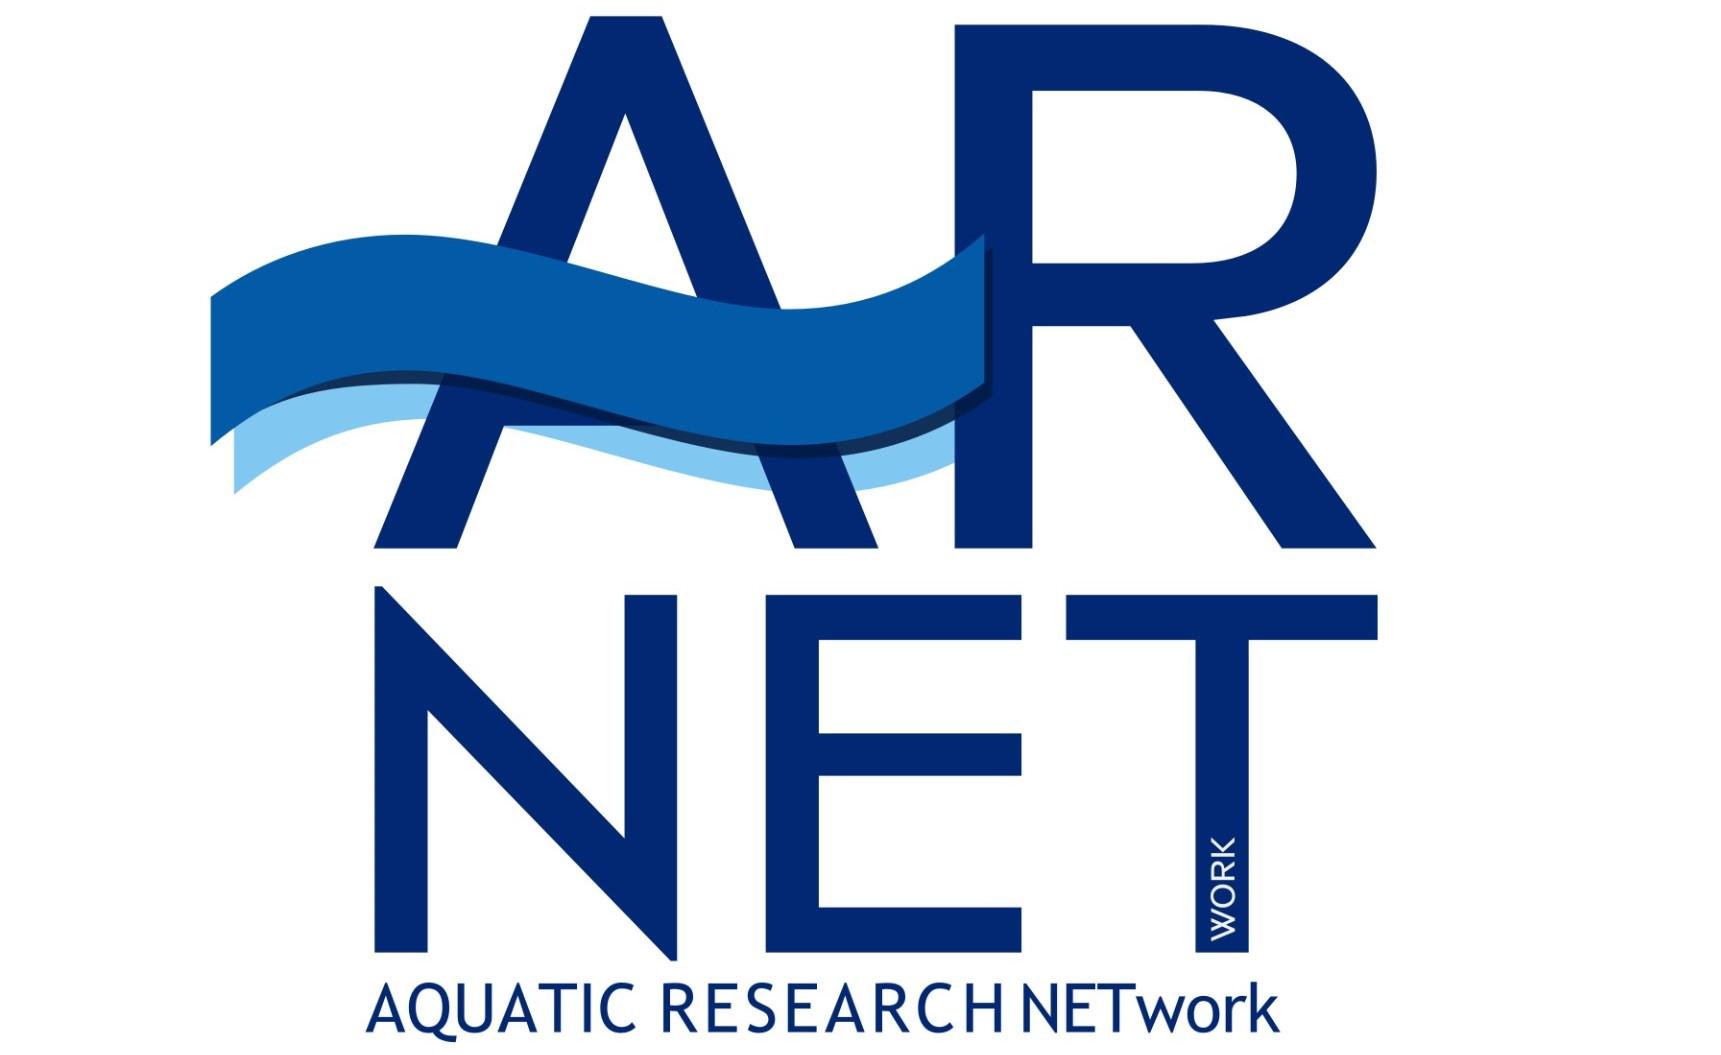 ARNET Associate Laboratory Approved